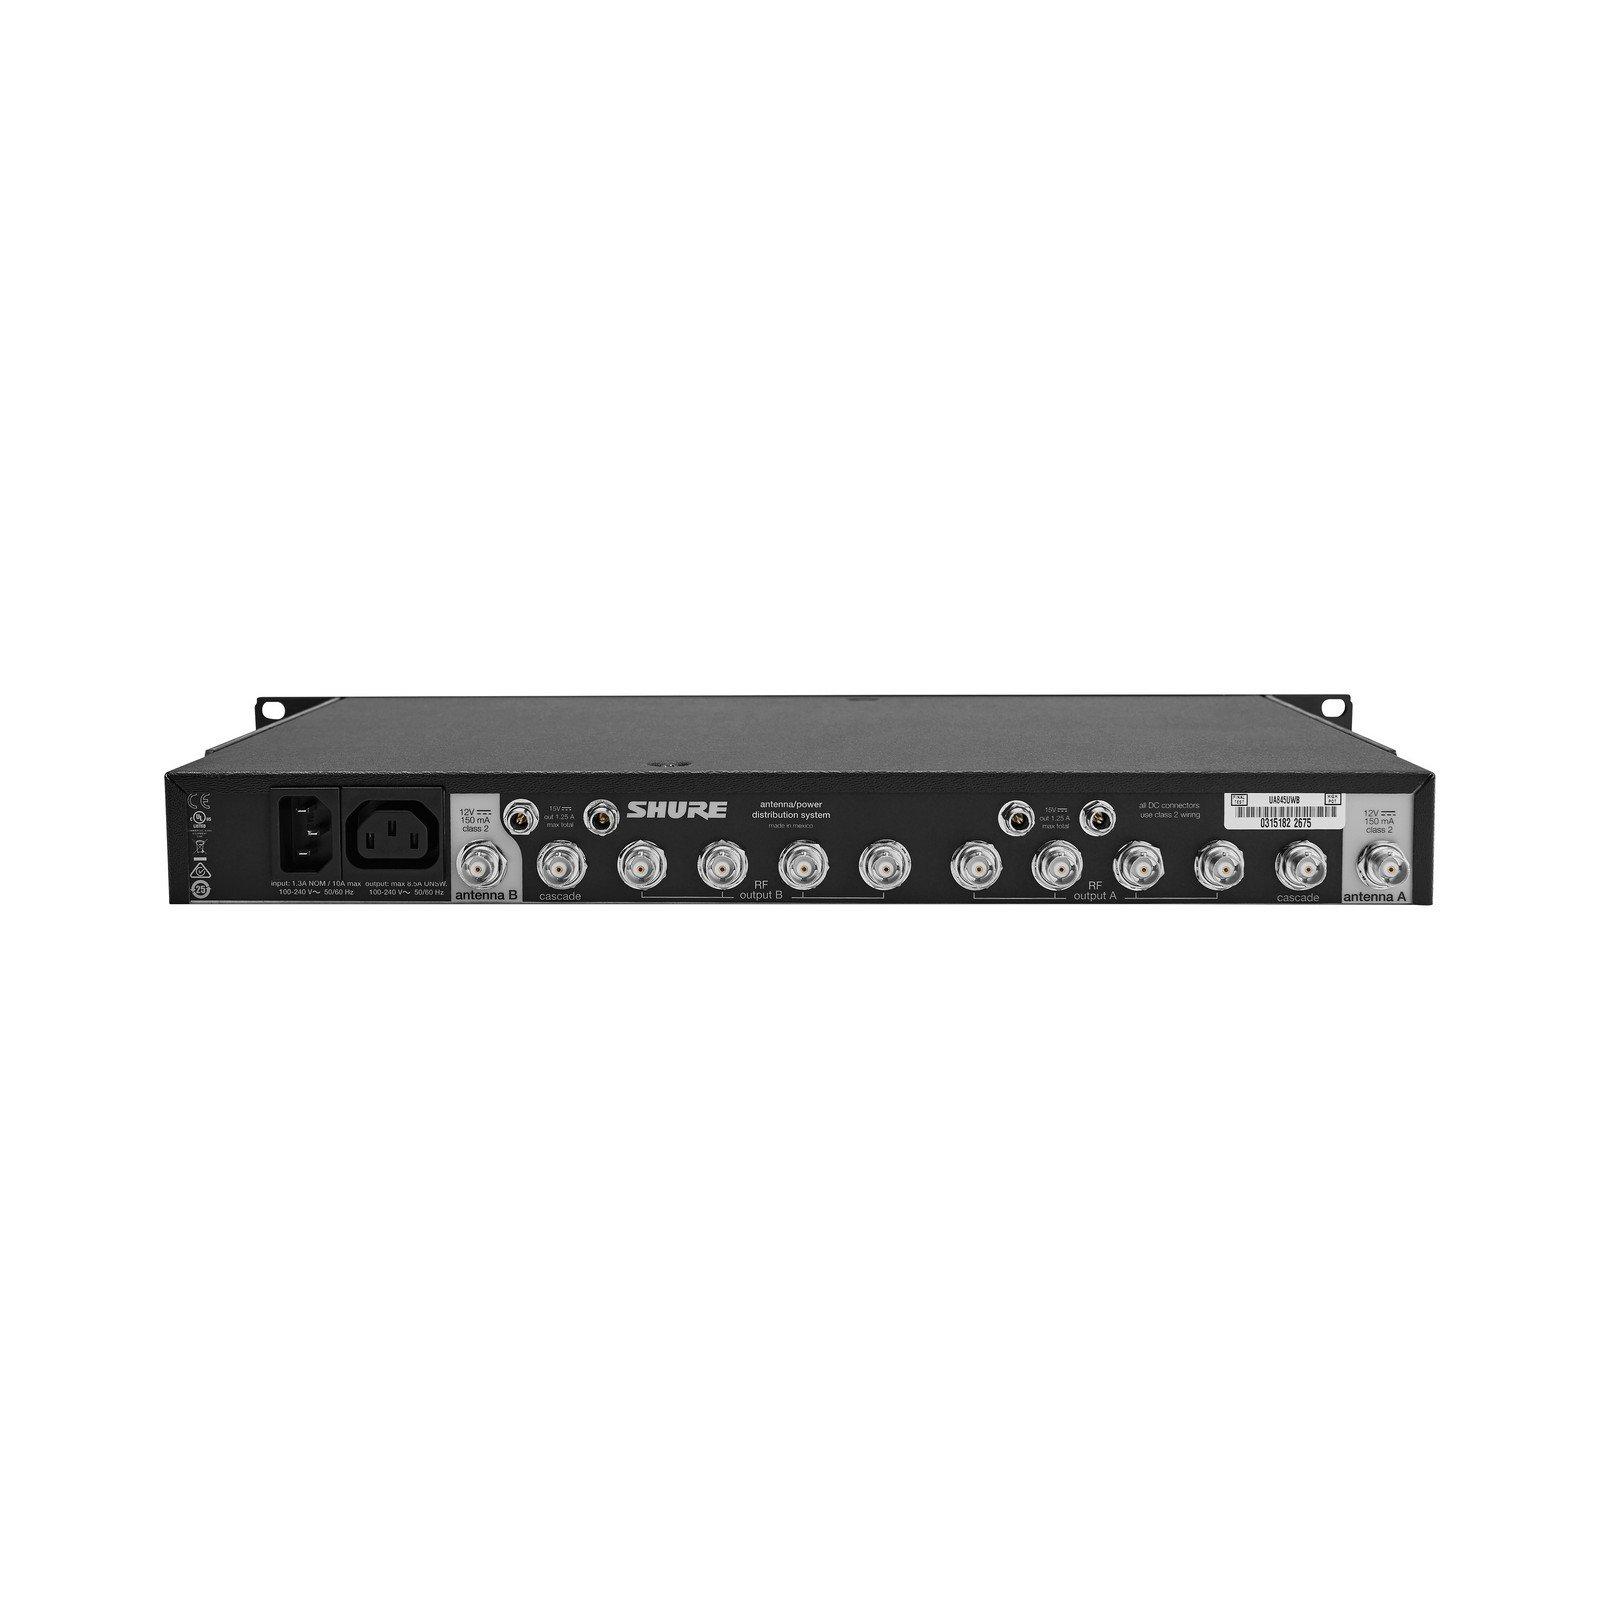 Shure UA845-UWB | Five Way Active Antenna Splitter Power Distributor by Shure (Image #1)